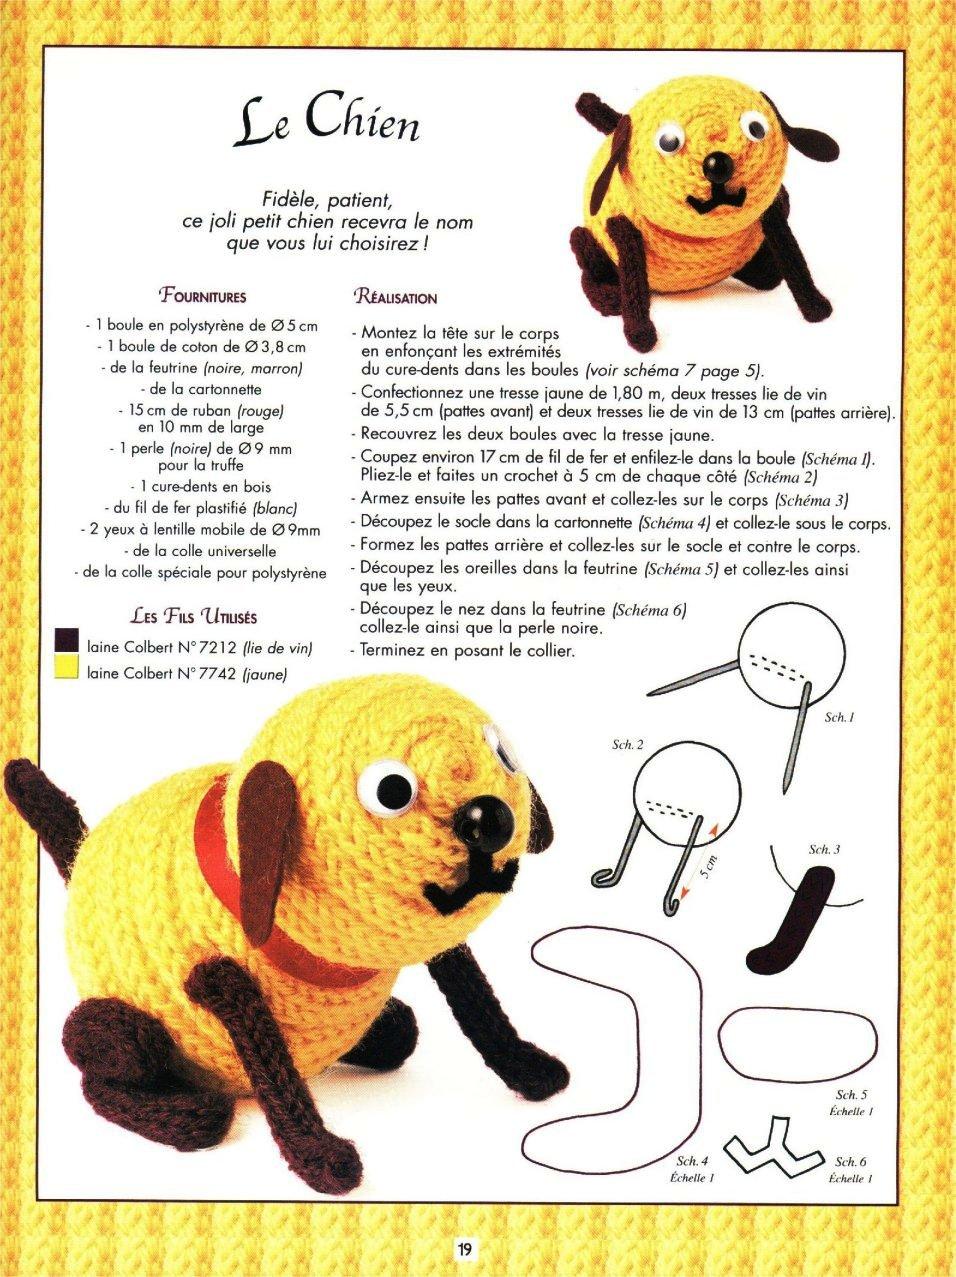 cachorro em crochet